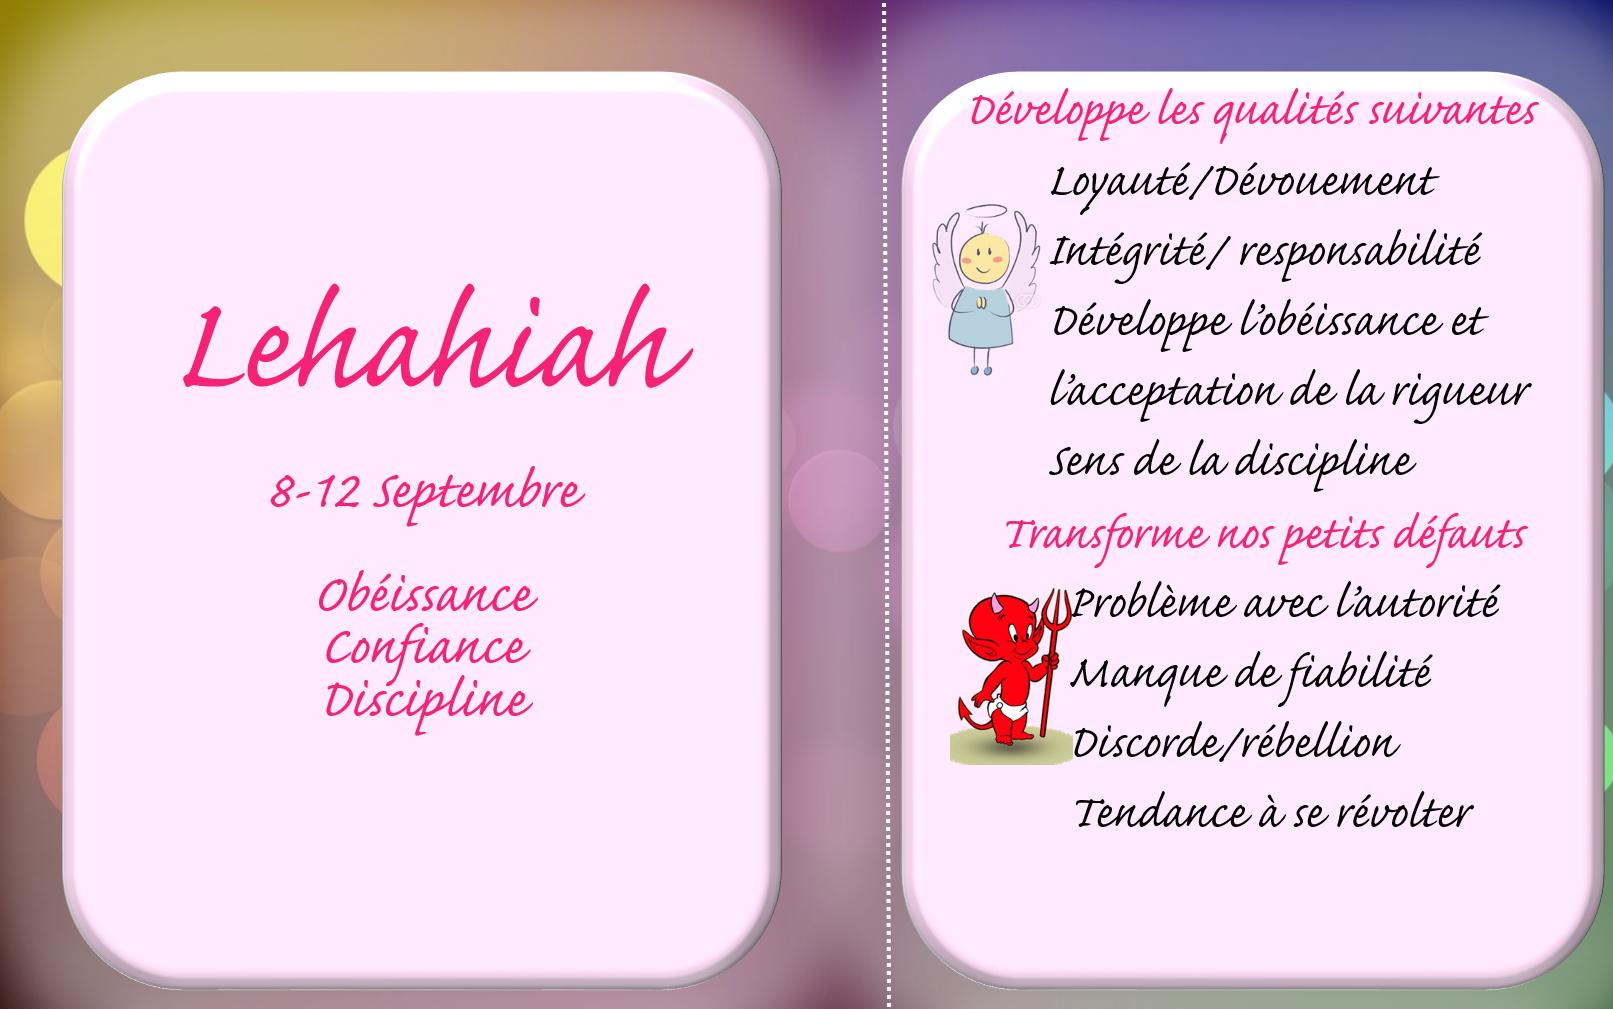 lehahiah